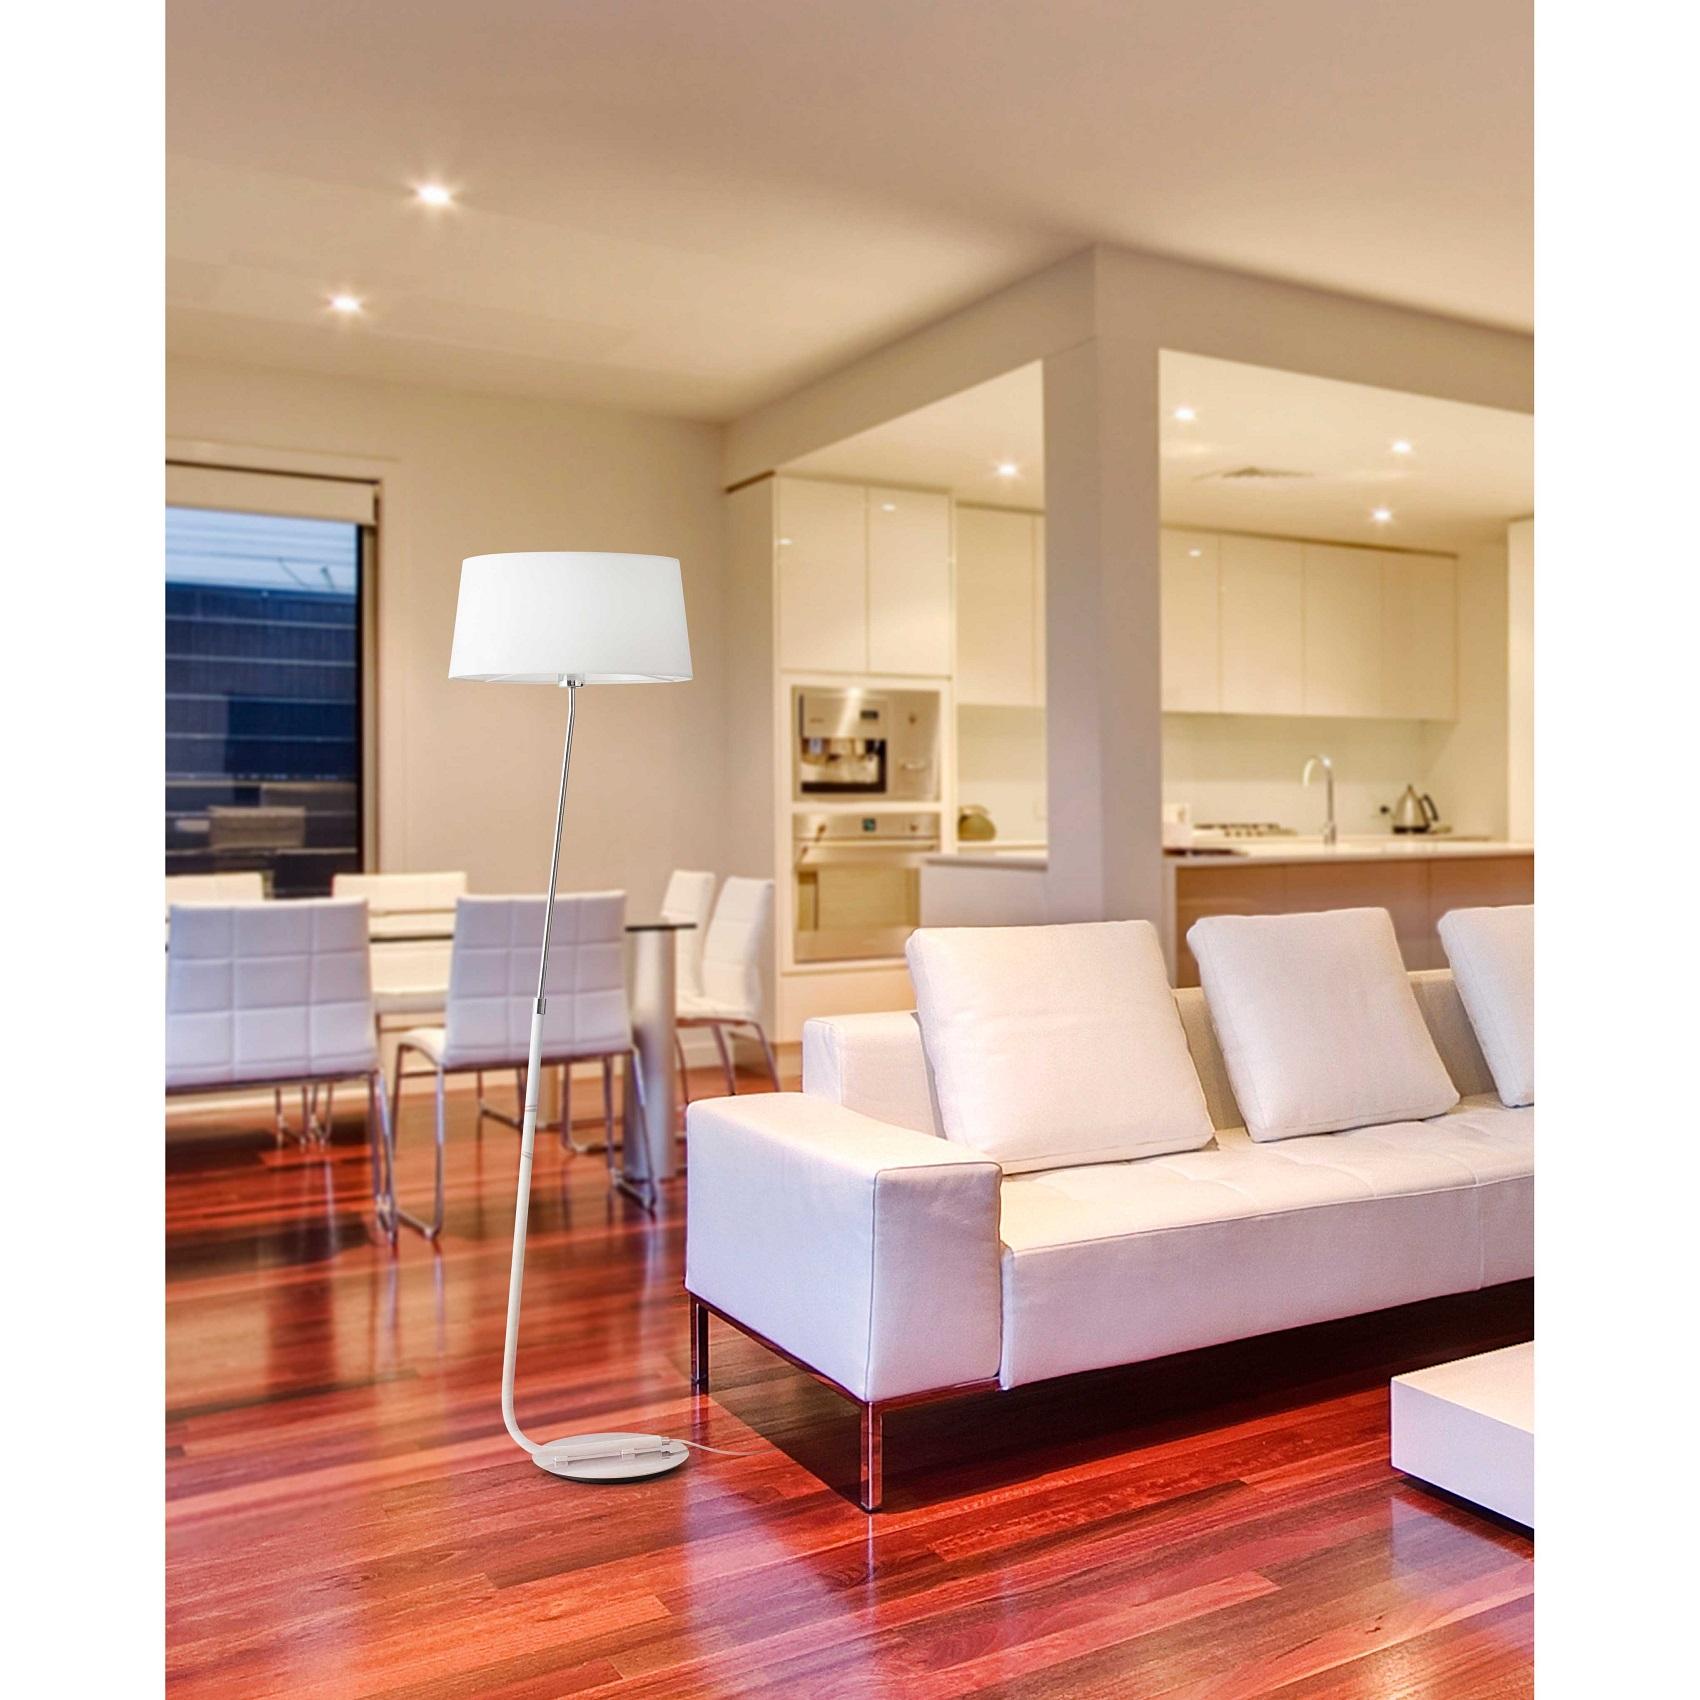 lampadaire design int rieur hotel faro blanc. Black Bedroom Furniture Sets. Home Design Ideas